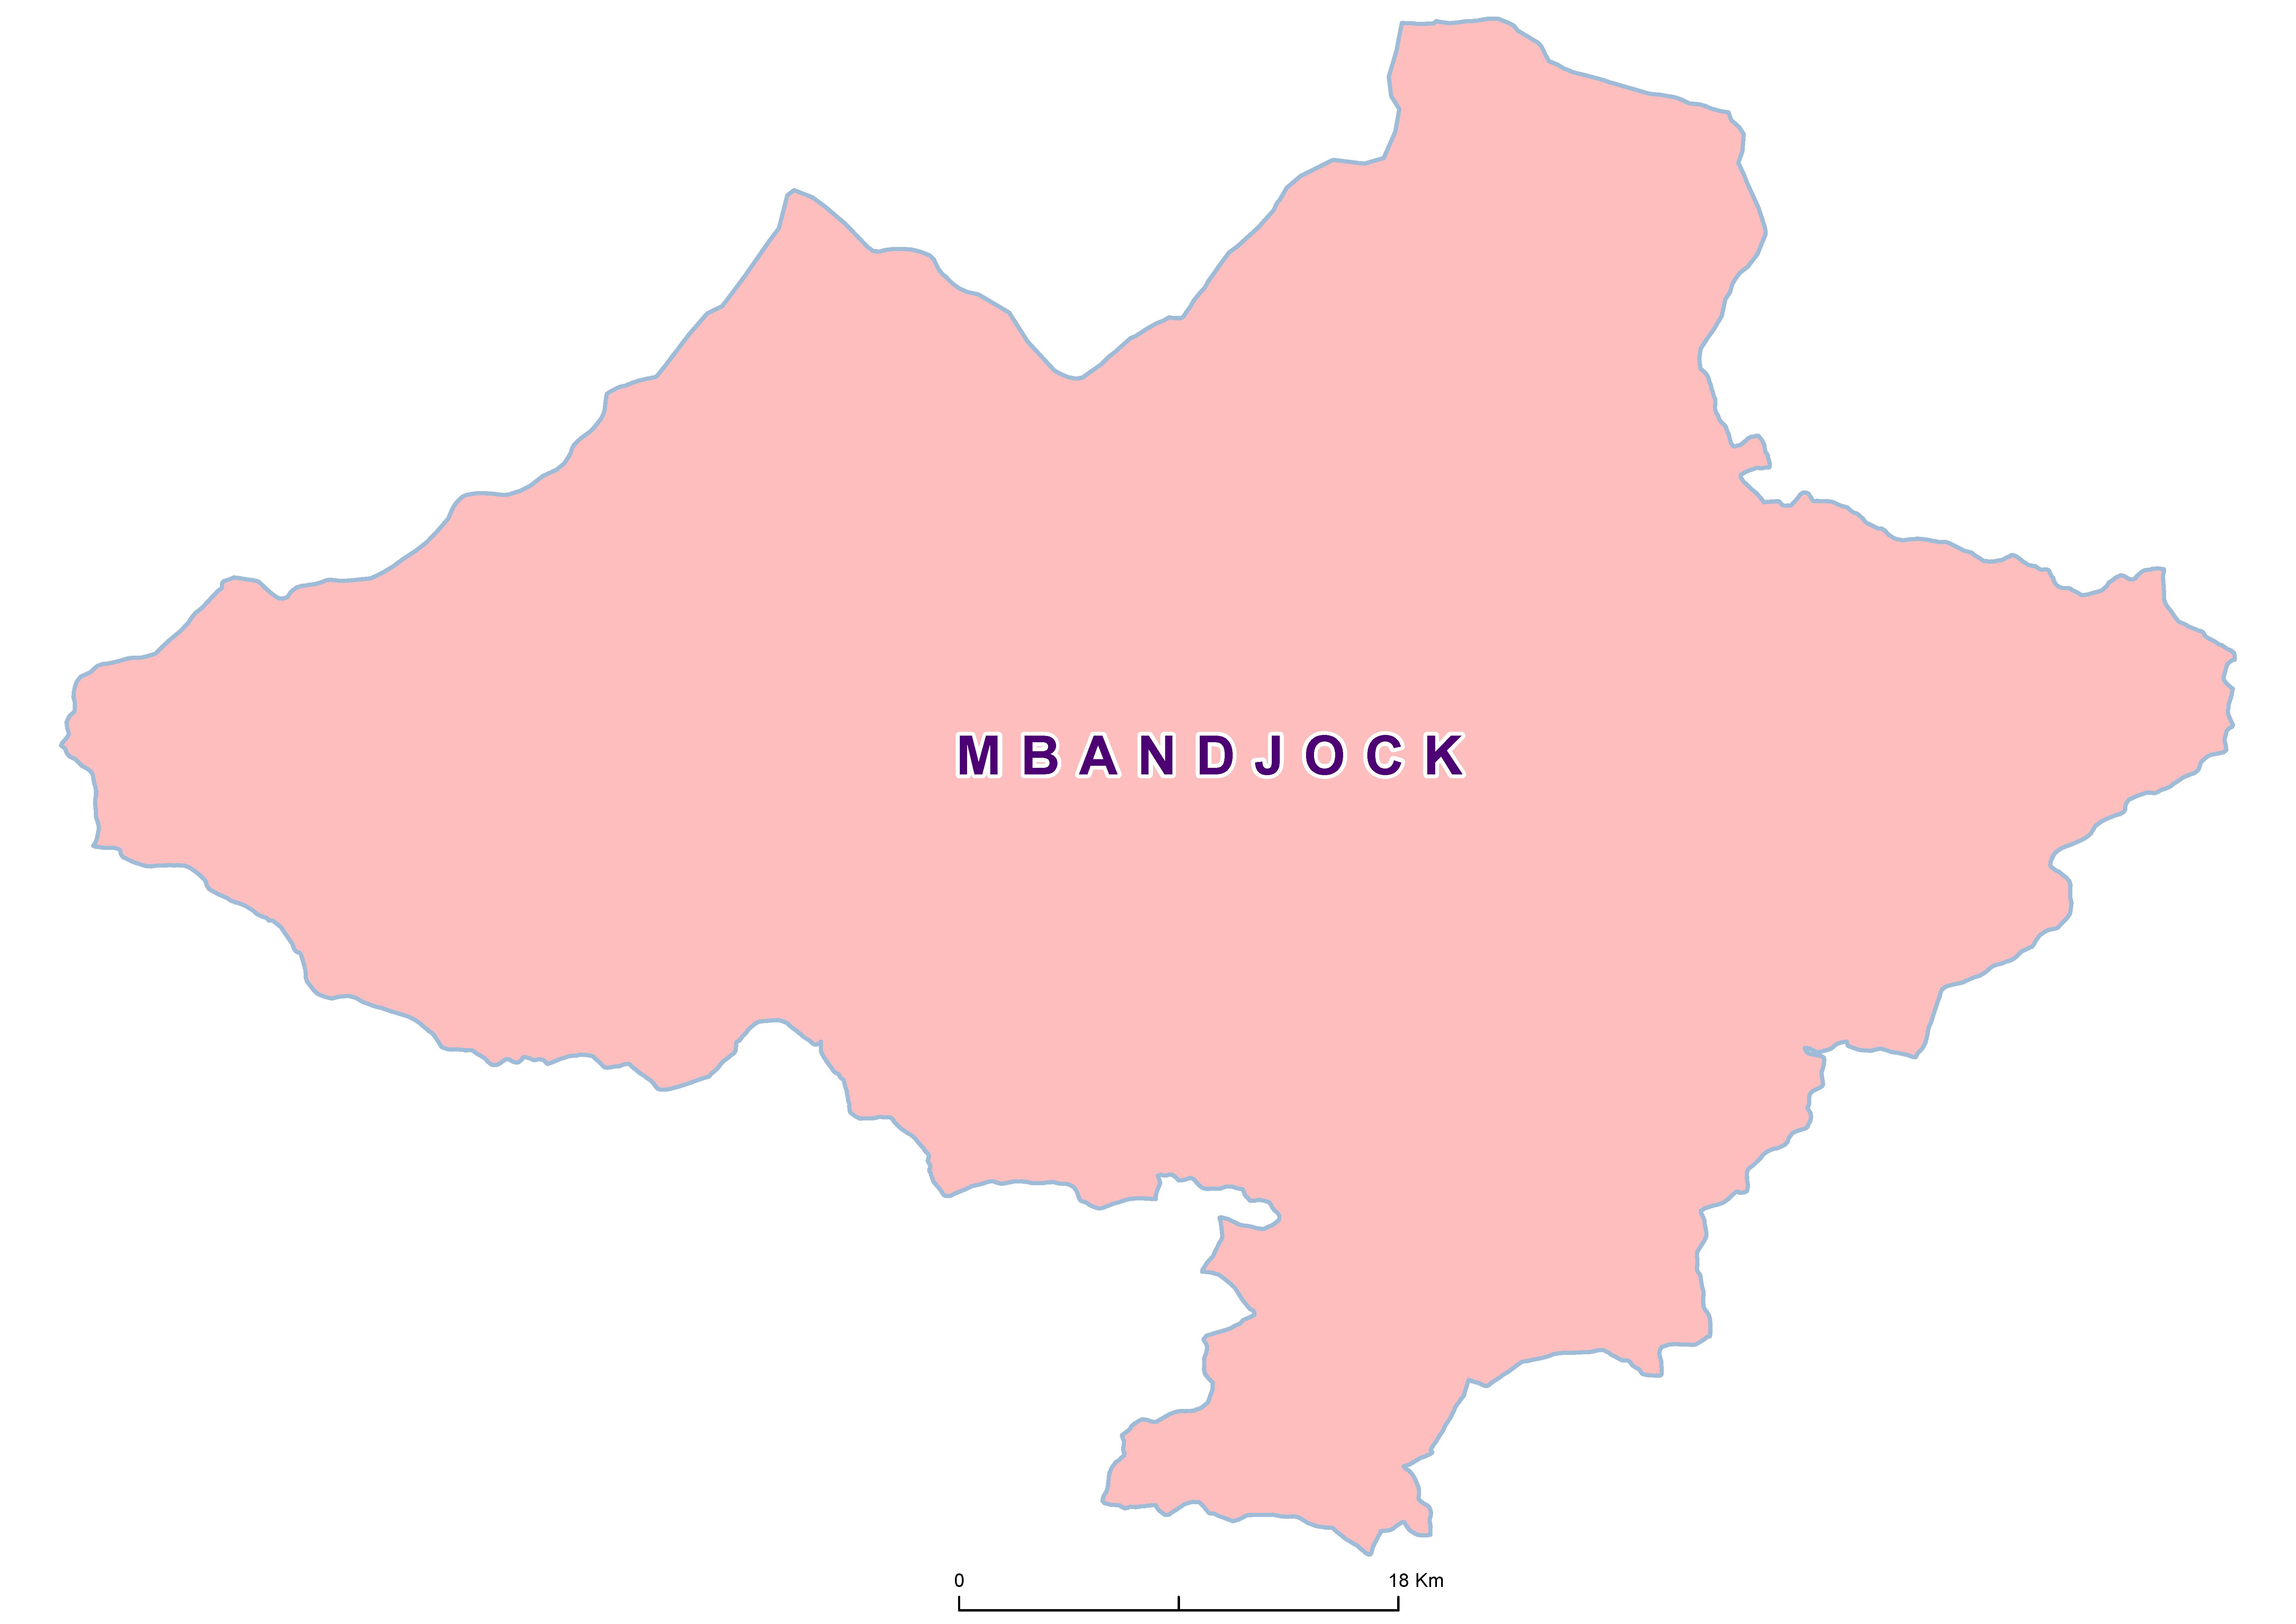 Mbandjock Max SCH 19850001